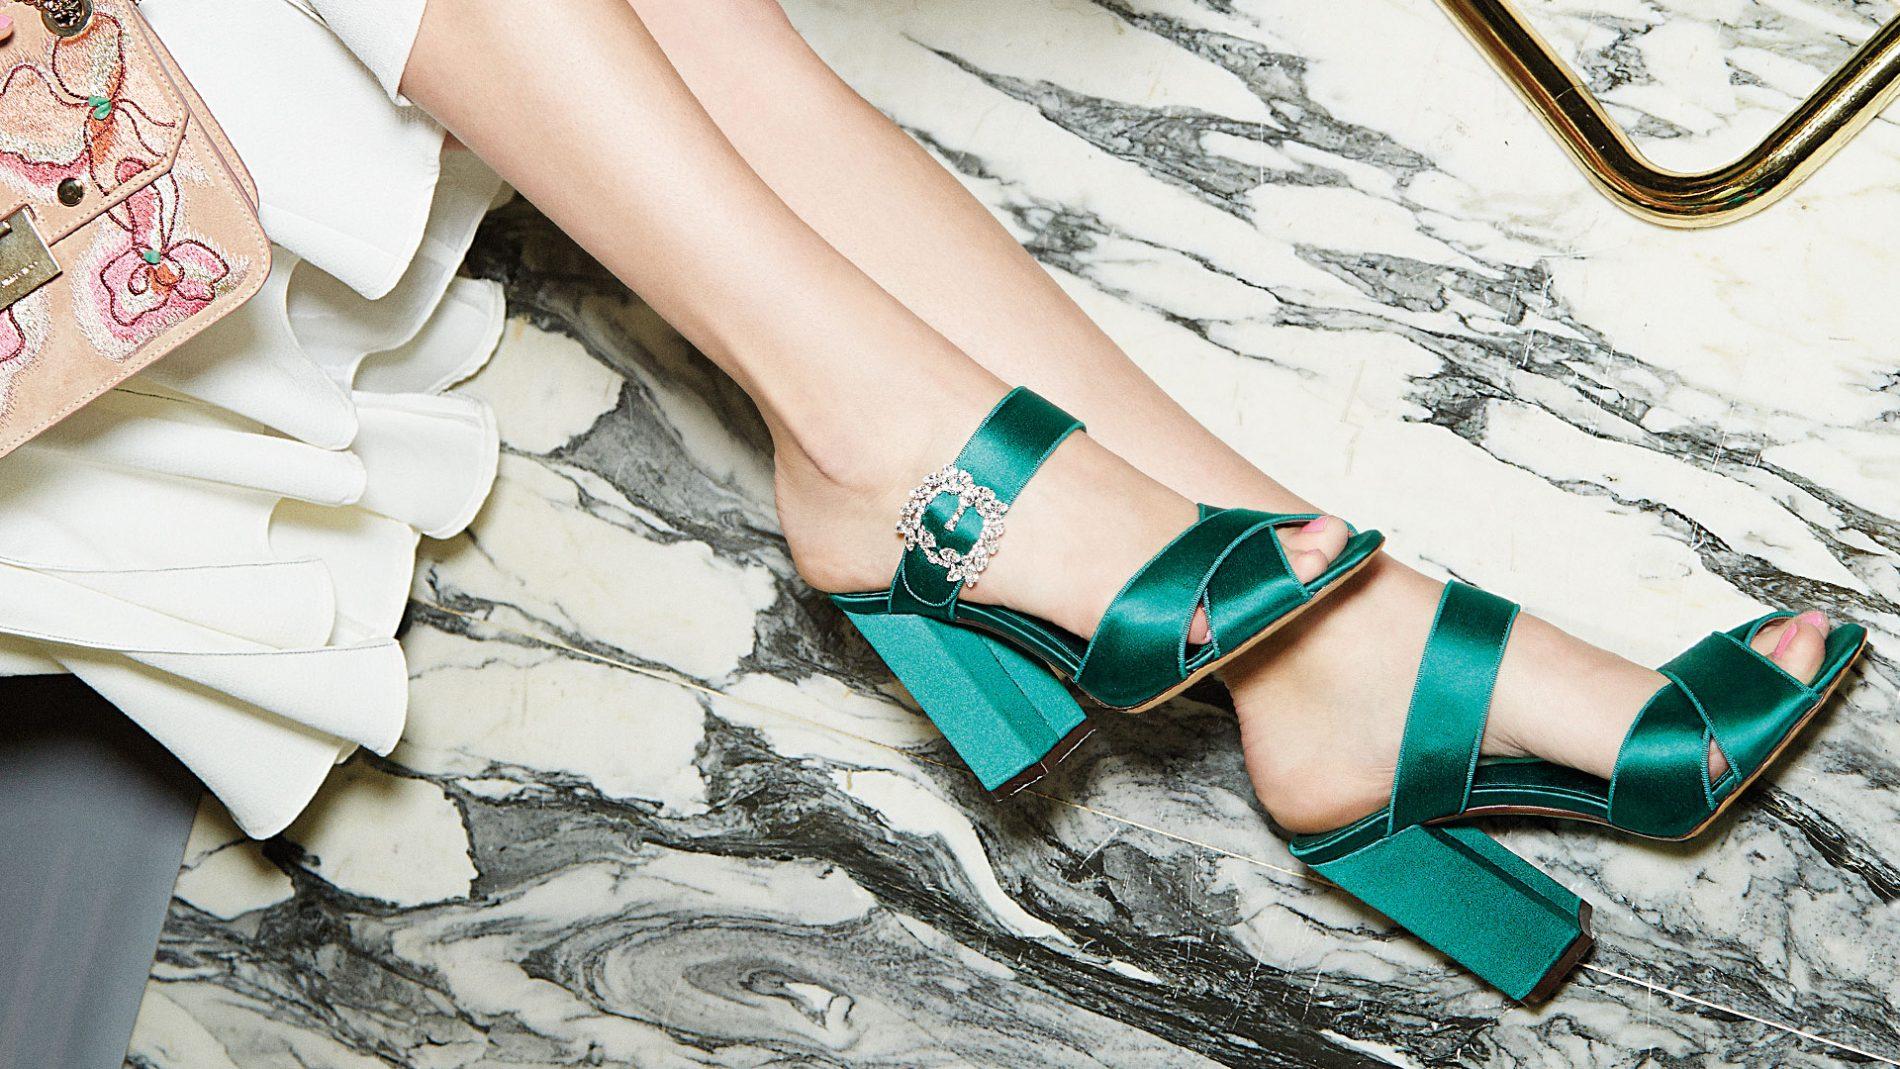 El Corte Inglés Diseñador Bolsos Zapatos Tabitha Simmons Jimmy Choo